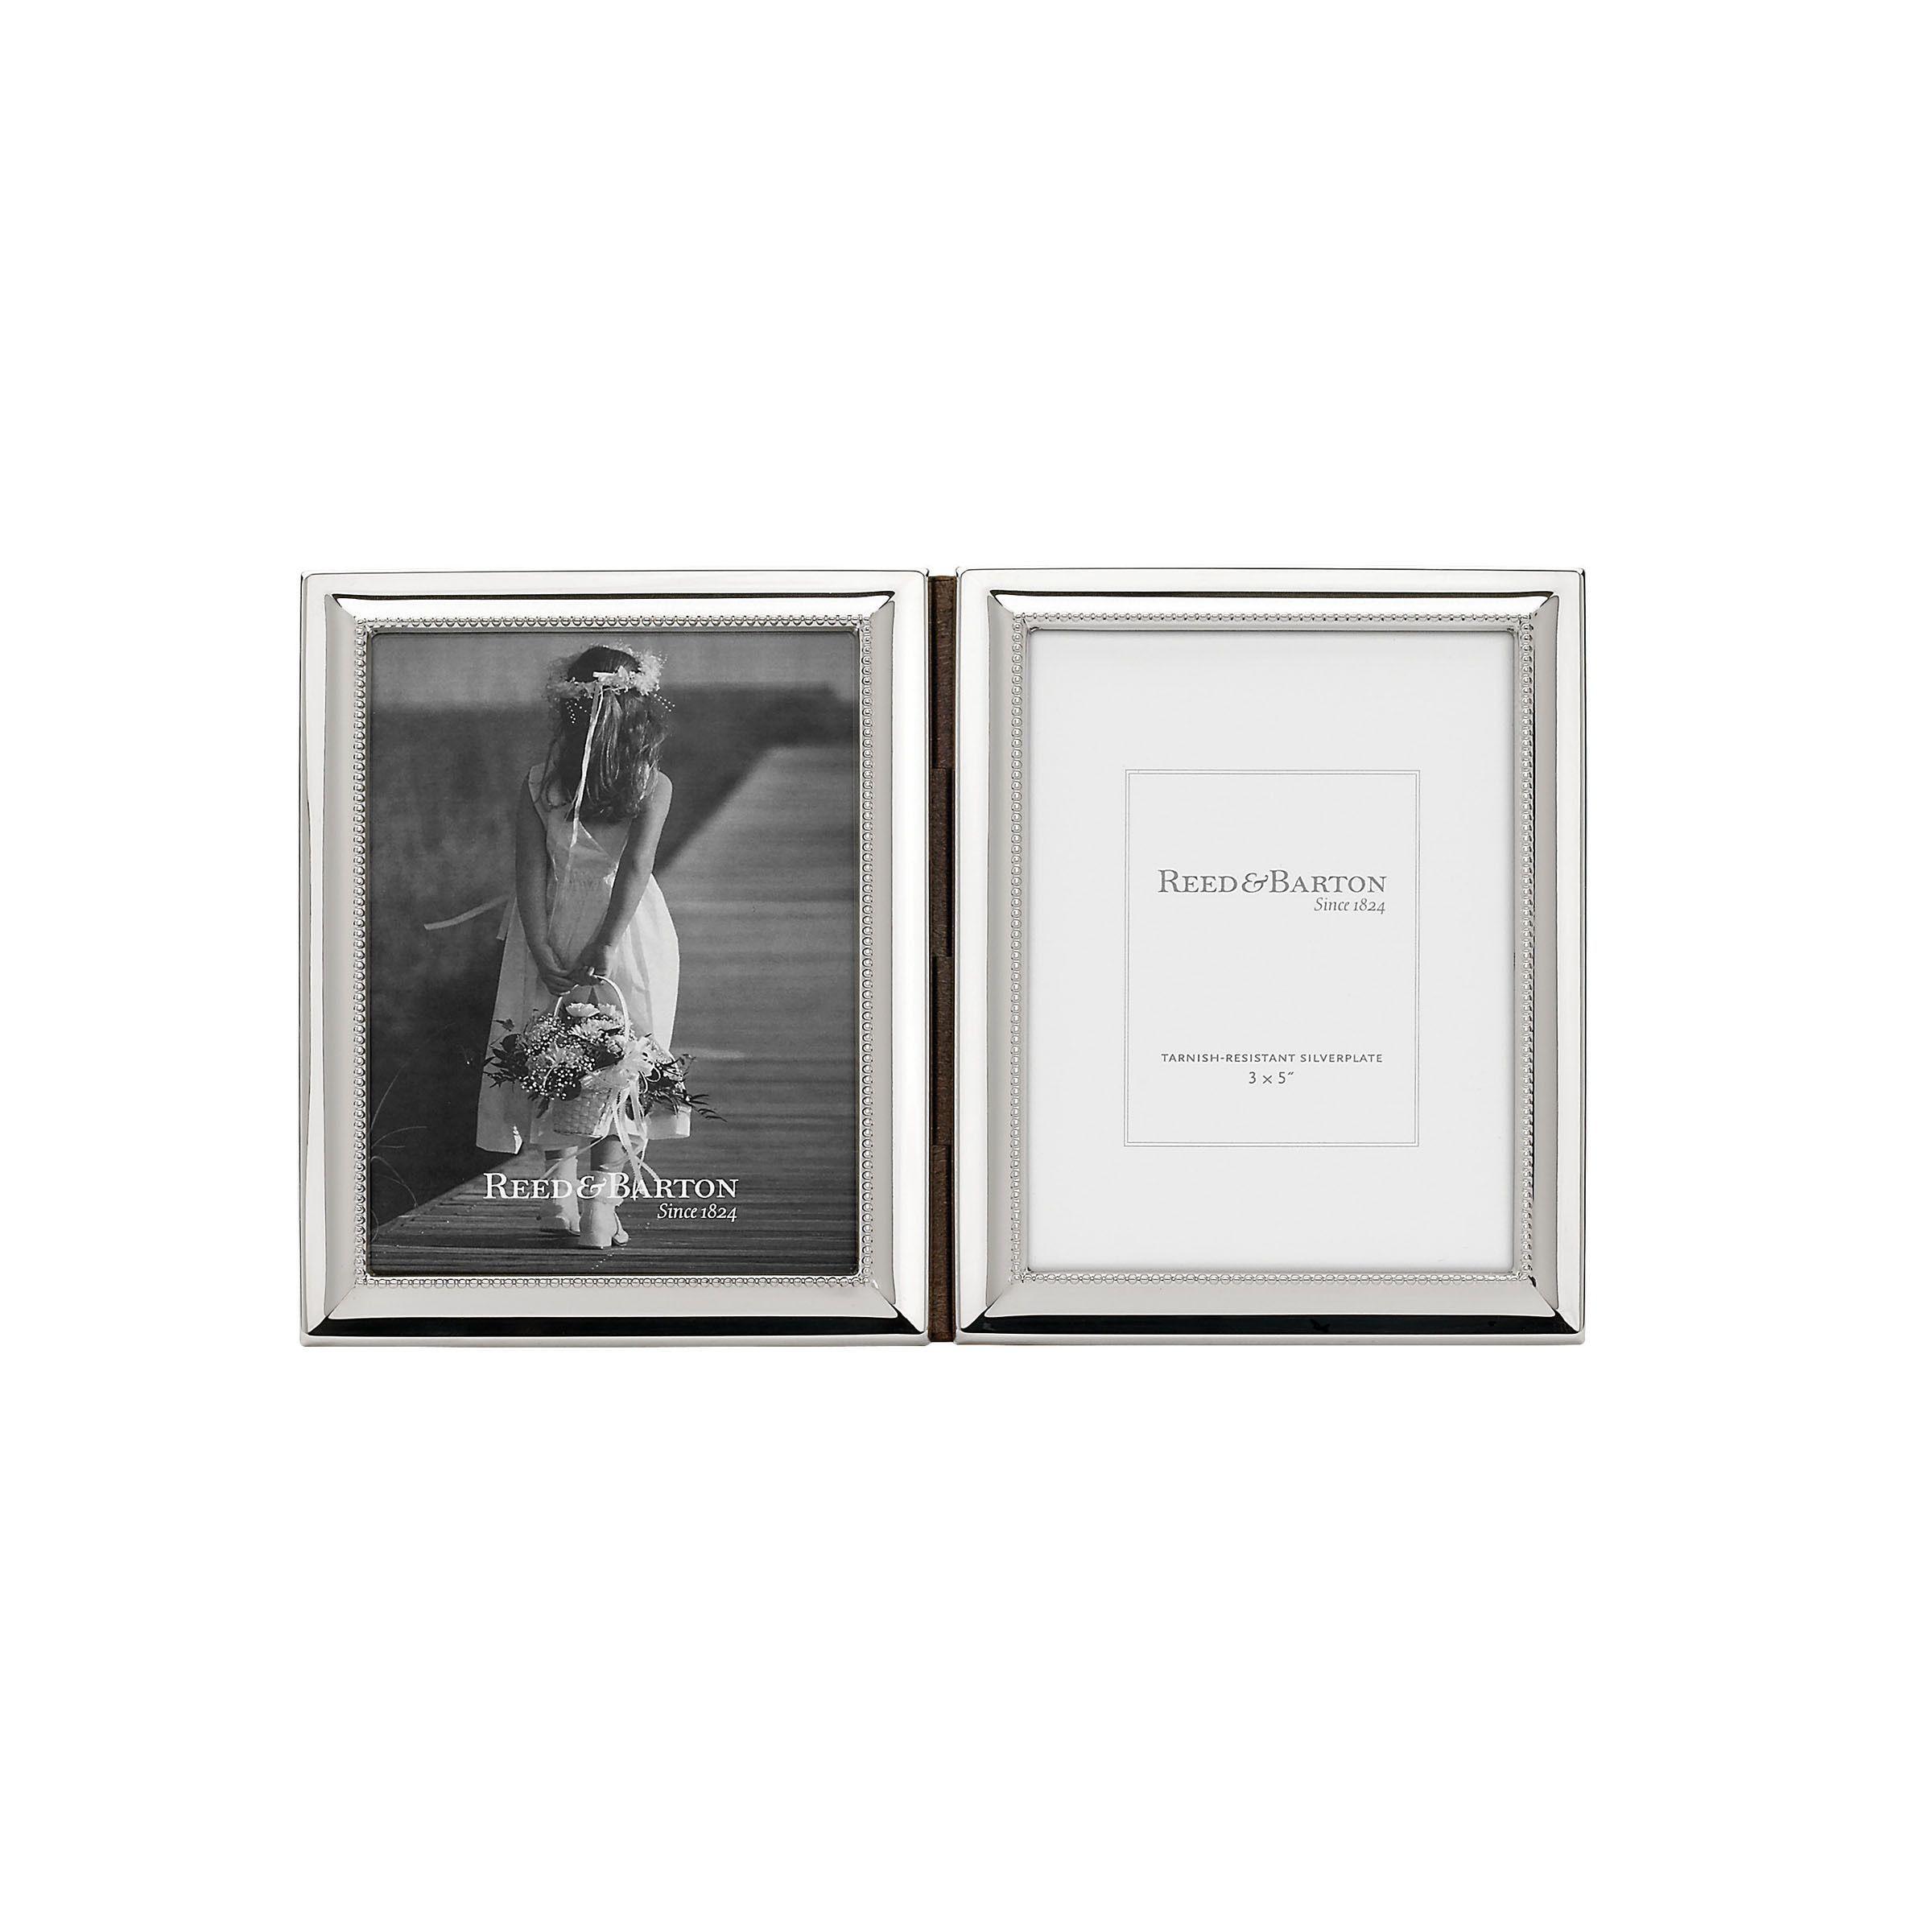 Reed & Barton Capri Silvercolored Glass and Metal 3-inch x 5-inch ...